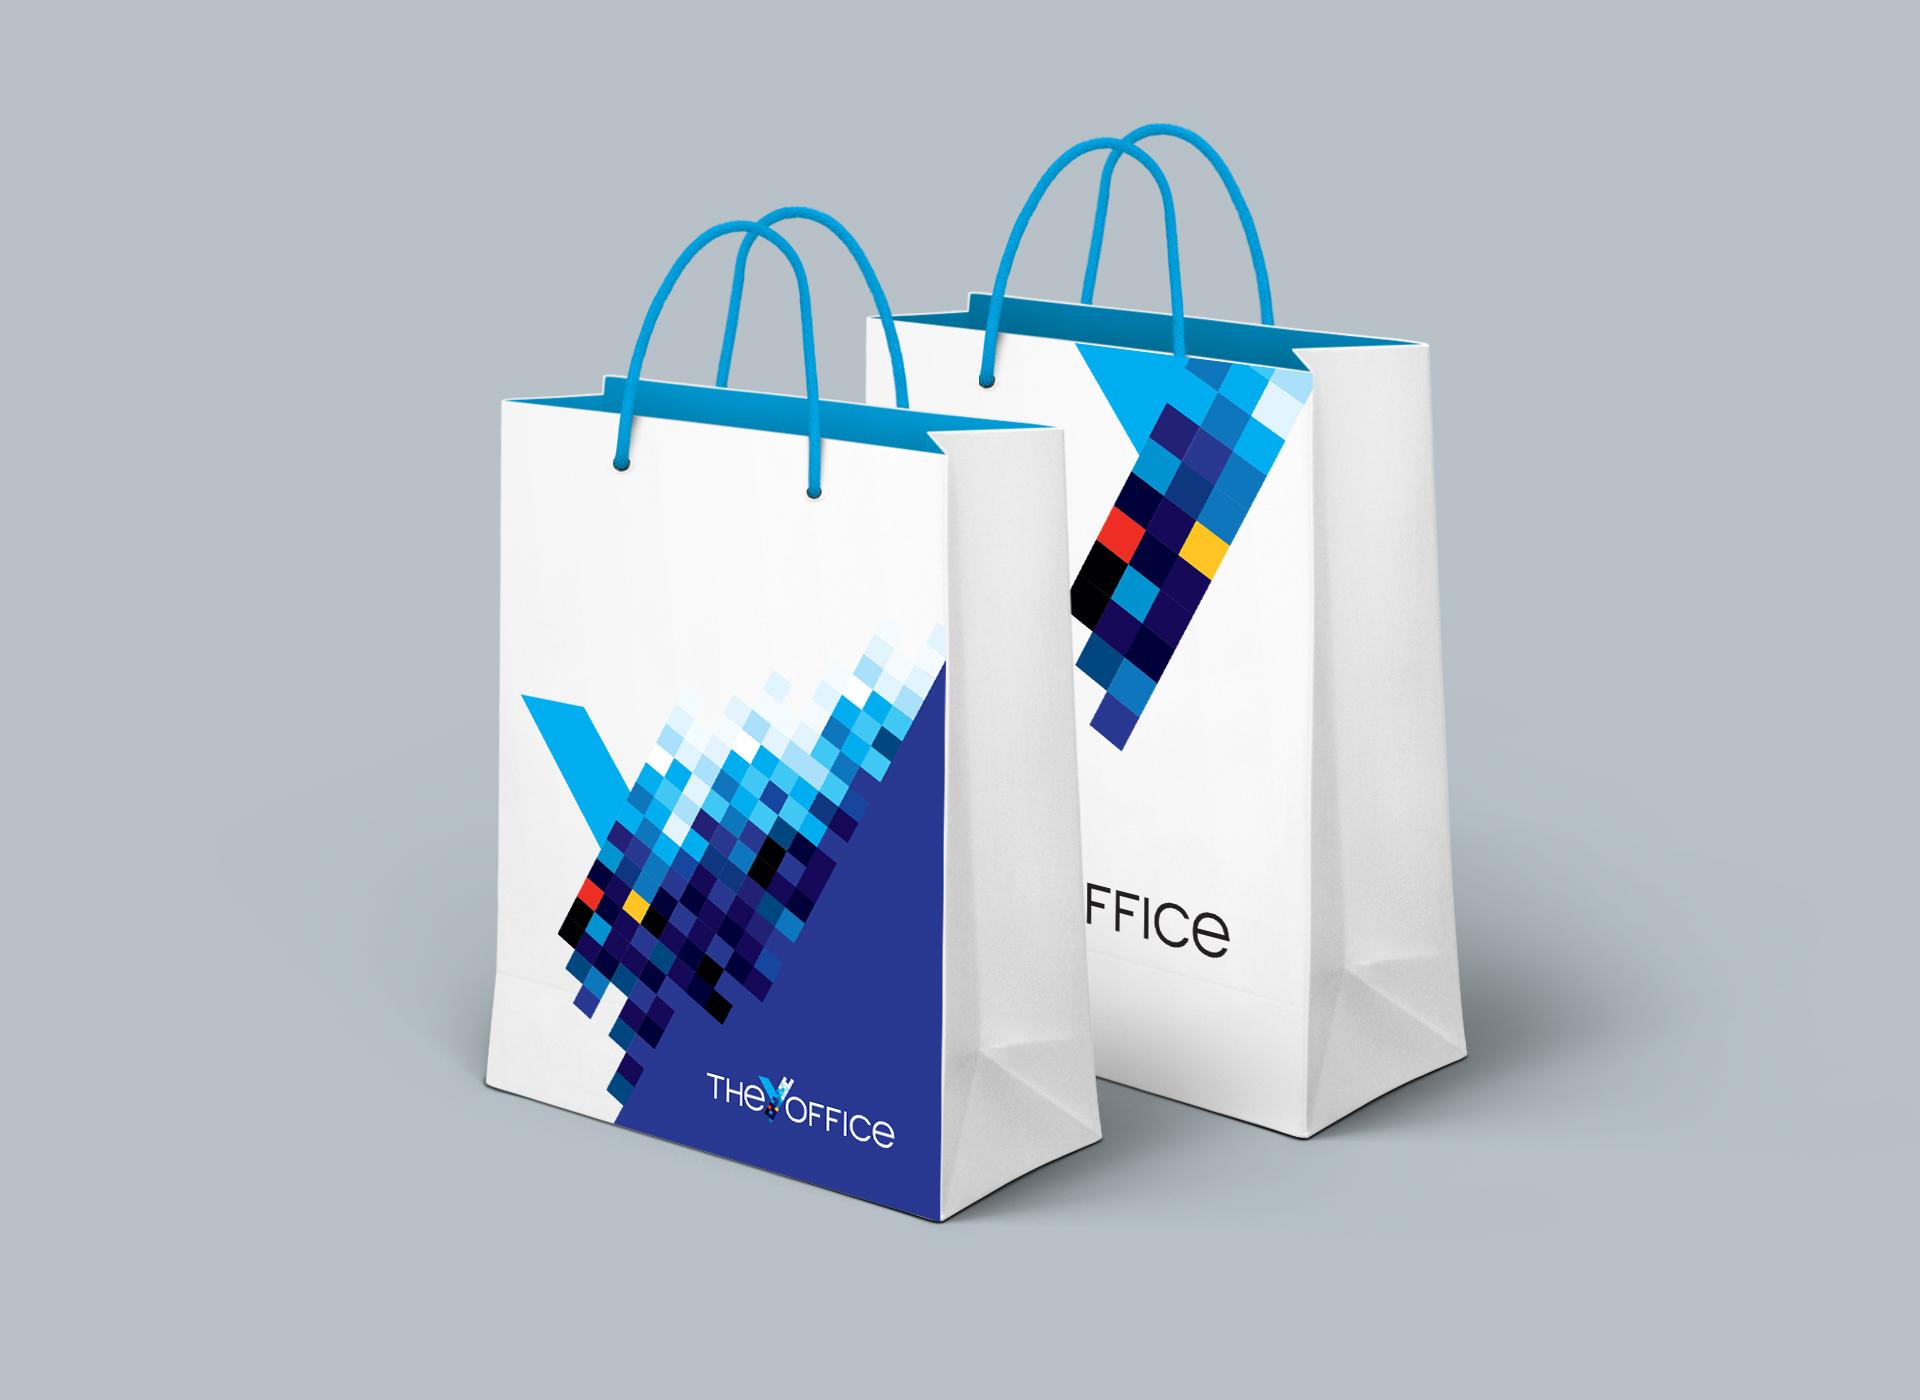 portofoliu inoveo the y office bags